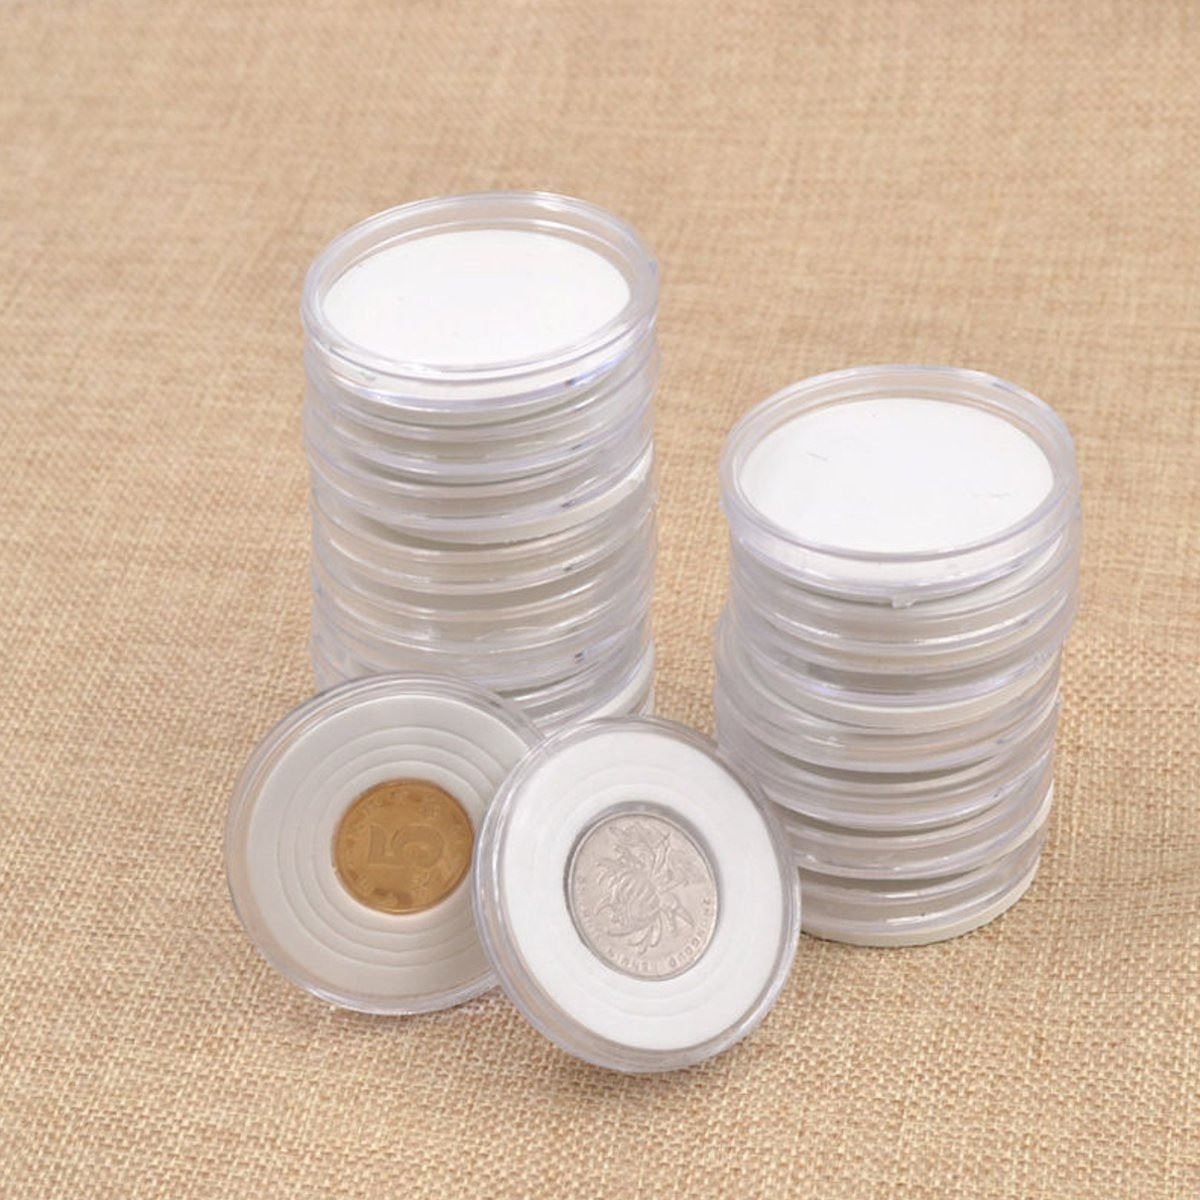 Пластиковая капсула круглый